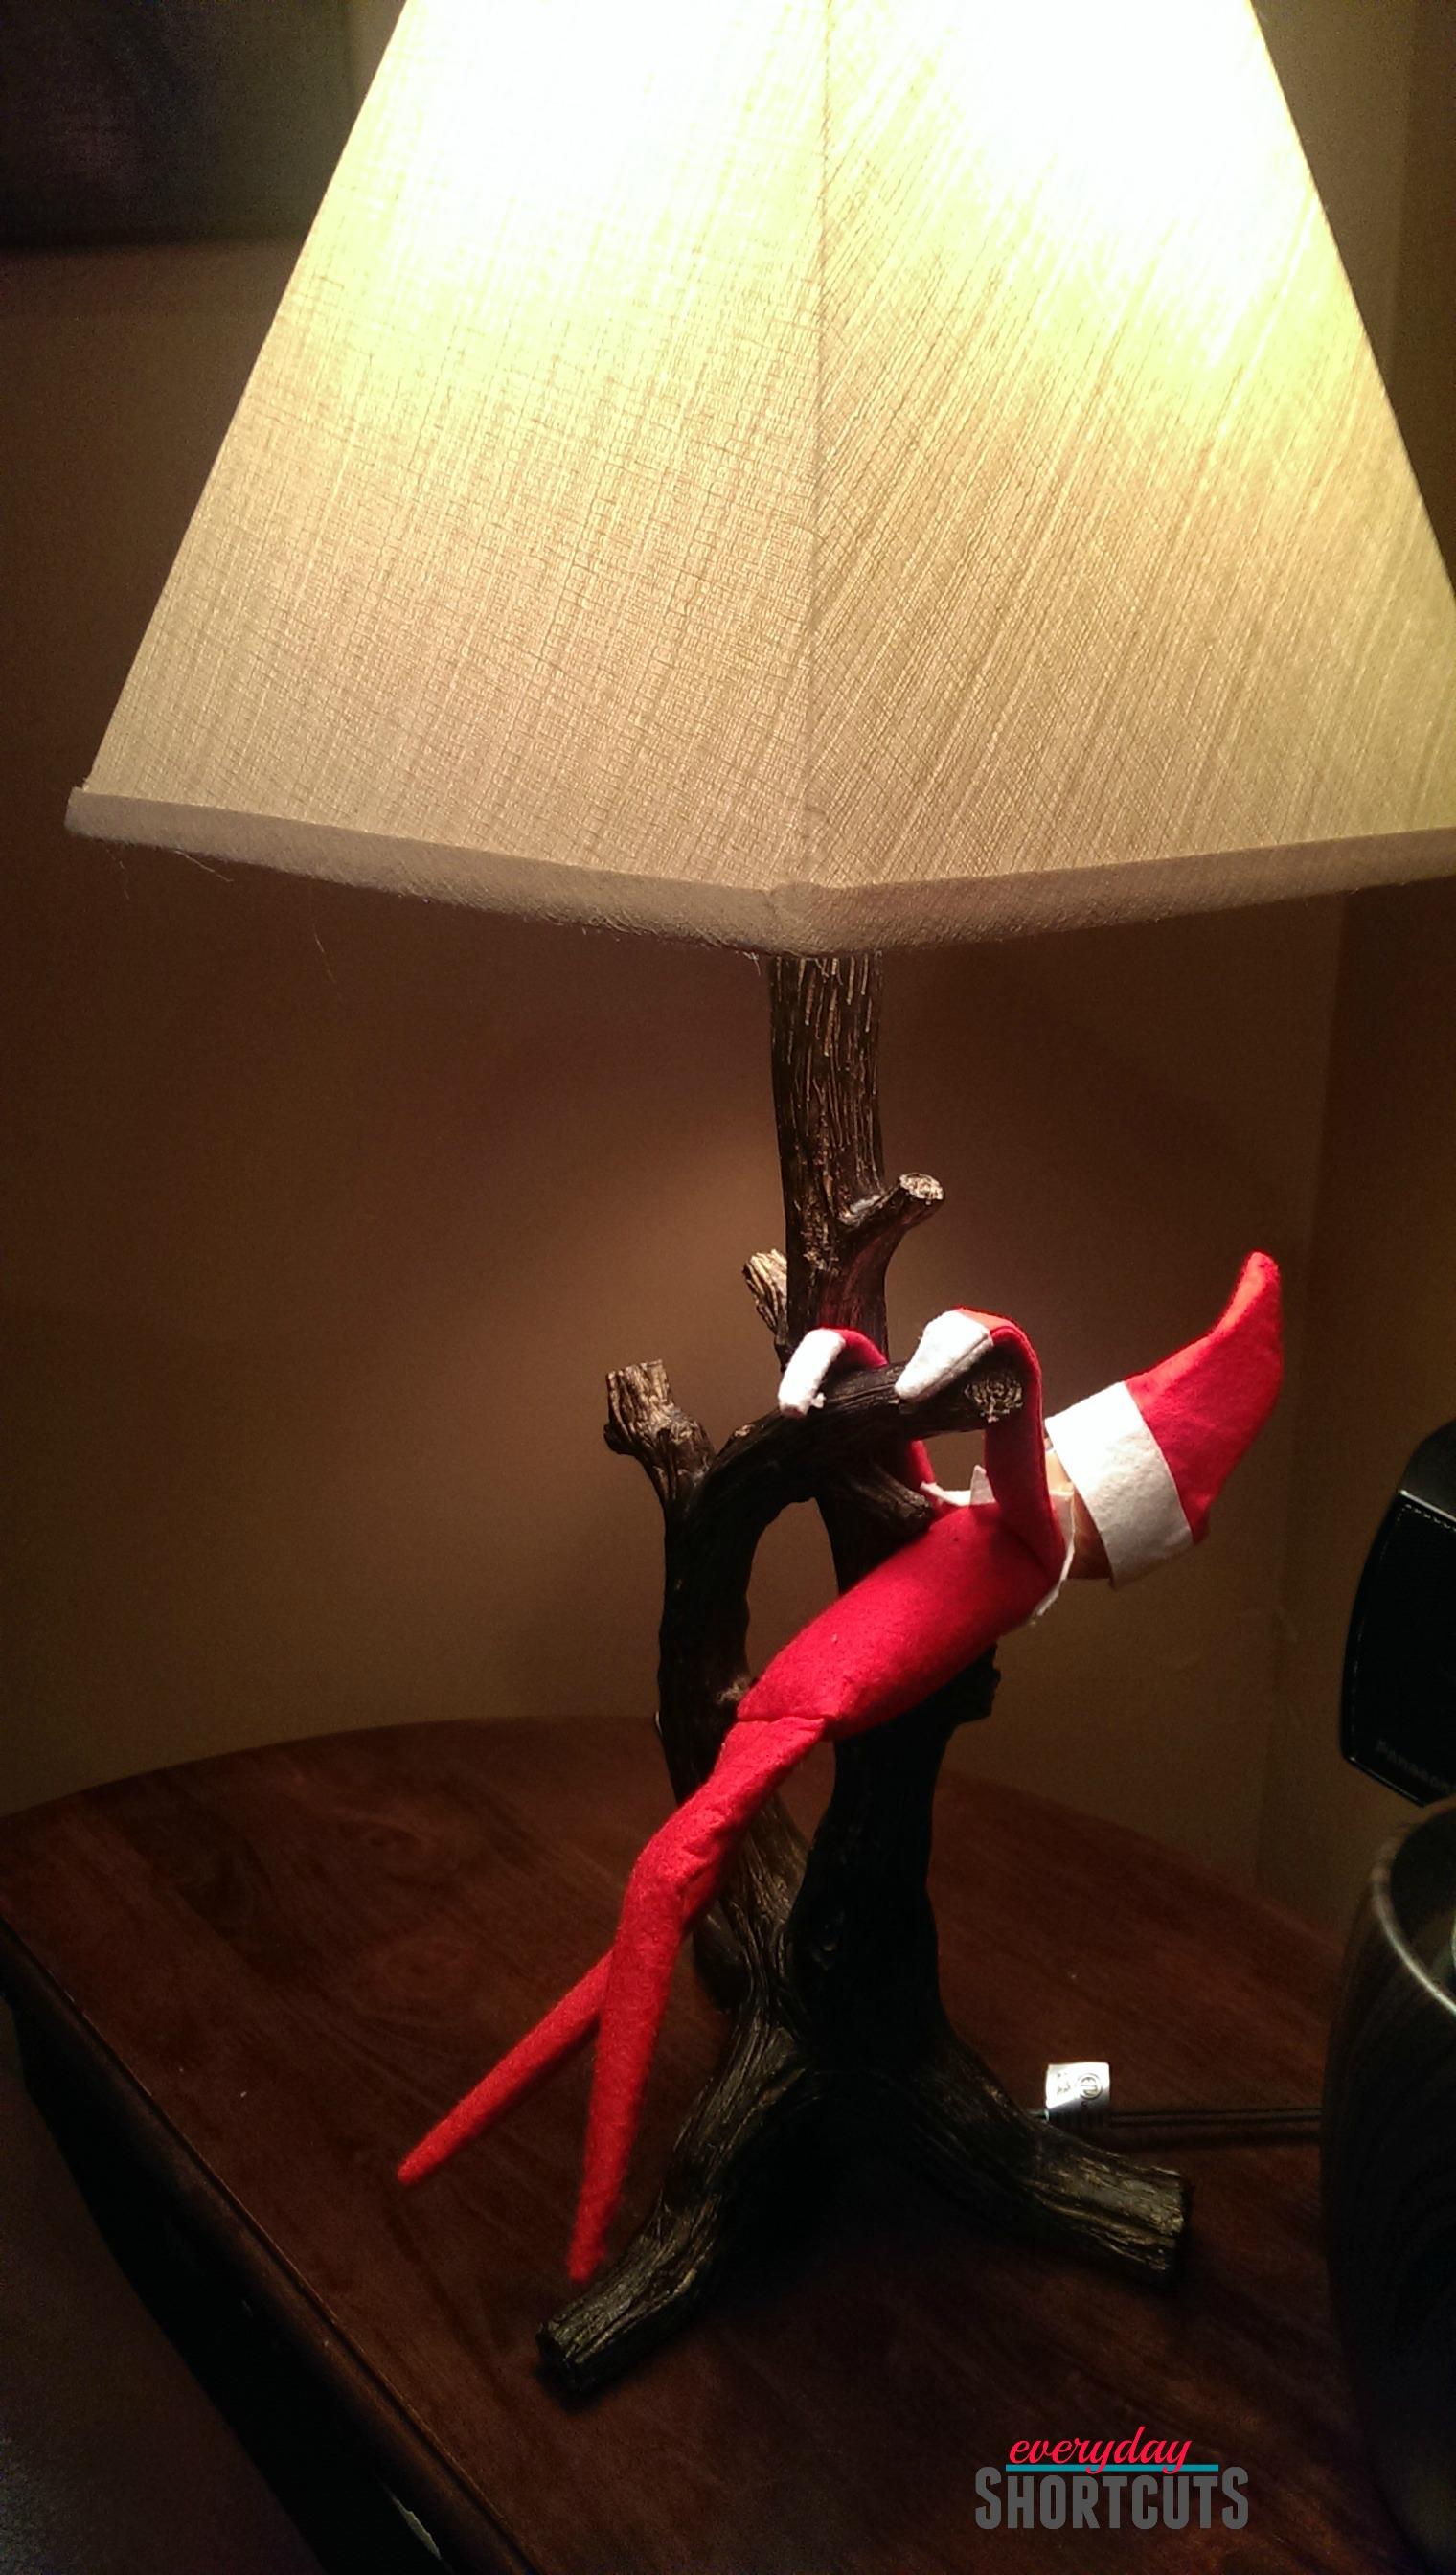 elf on the shelf swinging from lamp